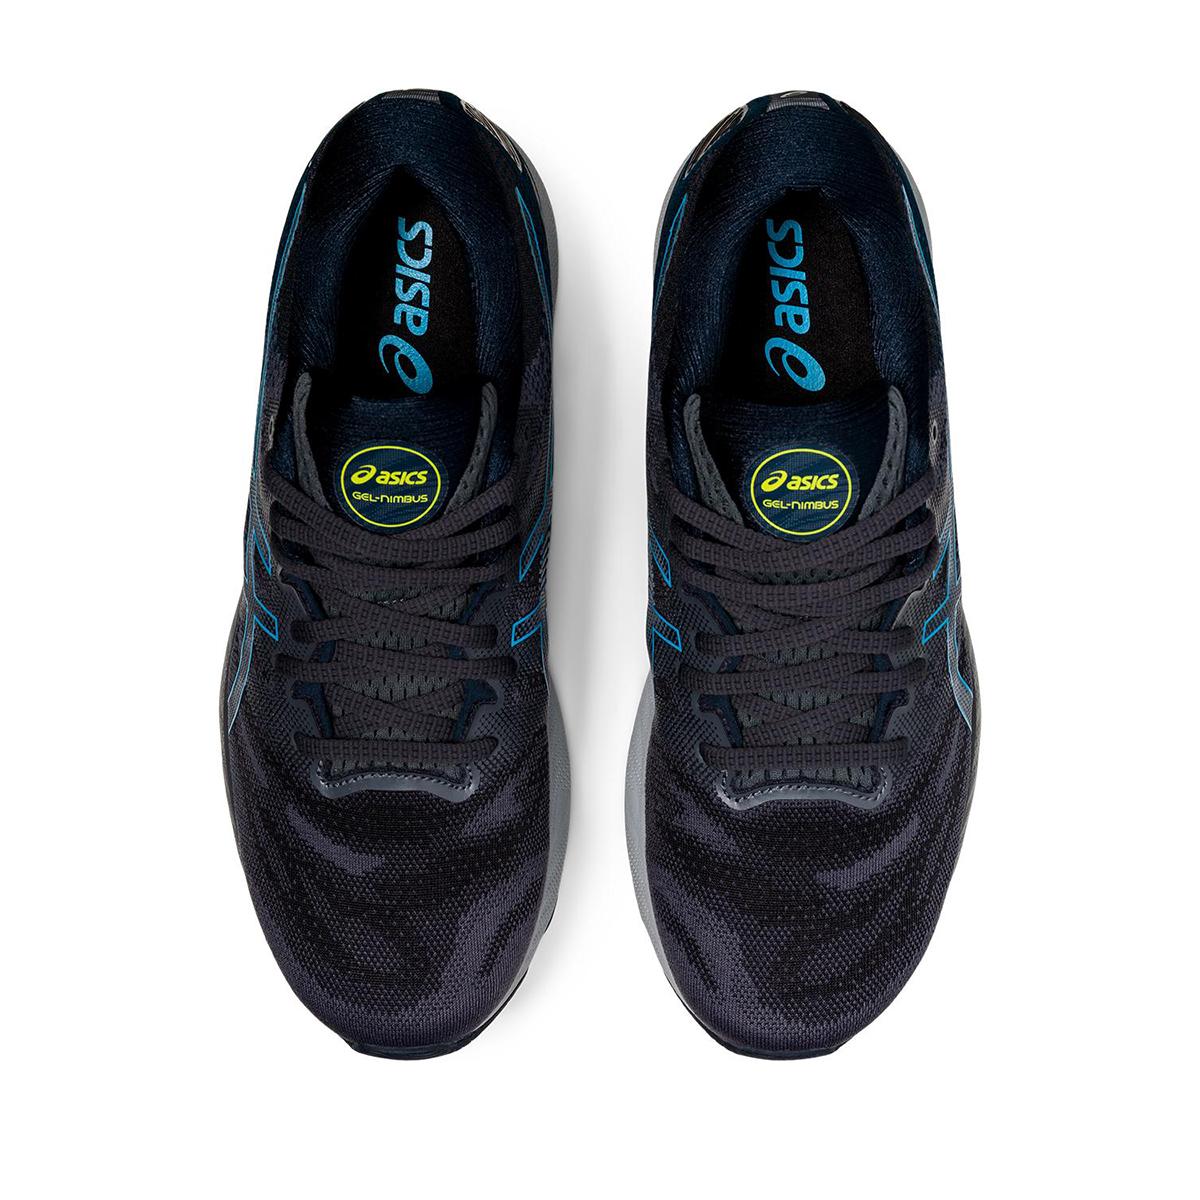 Men's Asics GEL-Nimbus 23 Running Shoe - Color: Carrier Grey/Digital Aqua - Size: 8.5 - Width: Regular, Carrier Grey/Digital Aqua, large, image 5